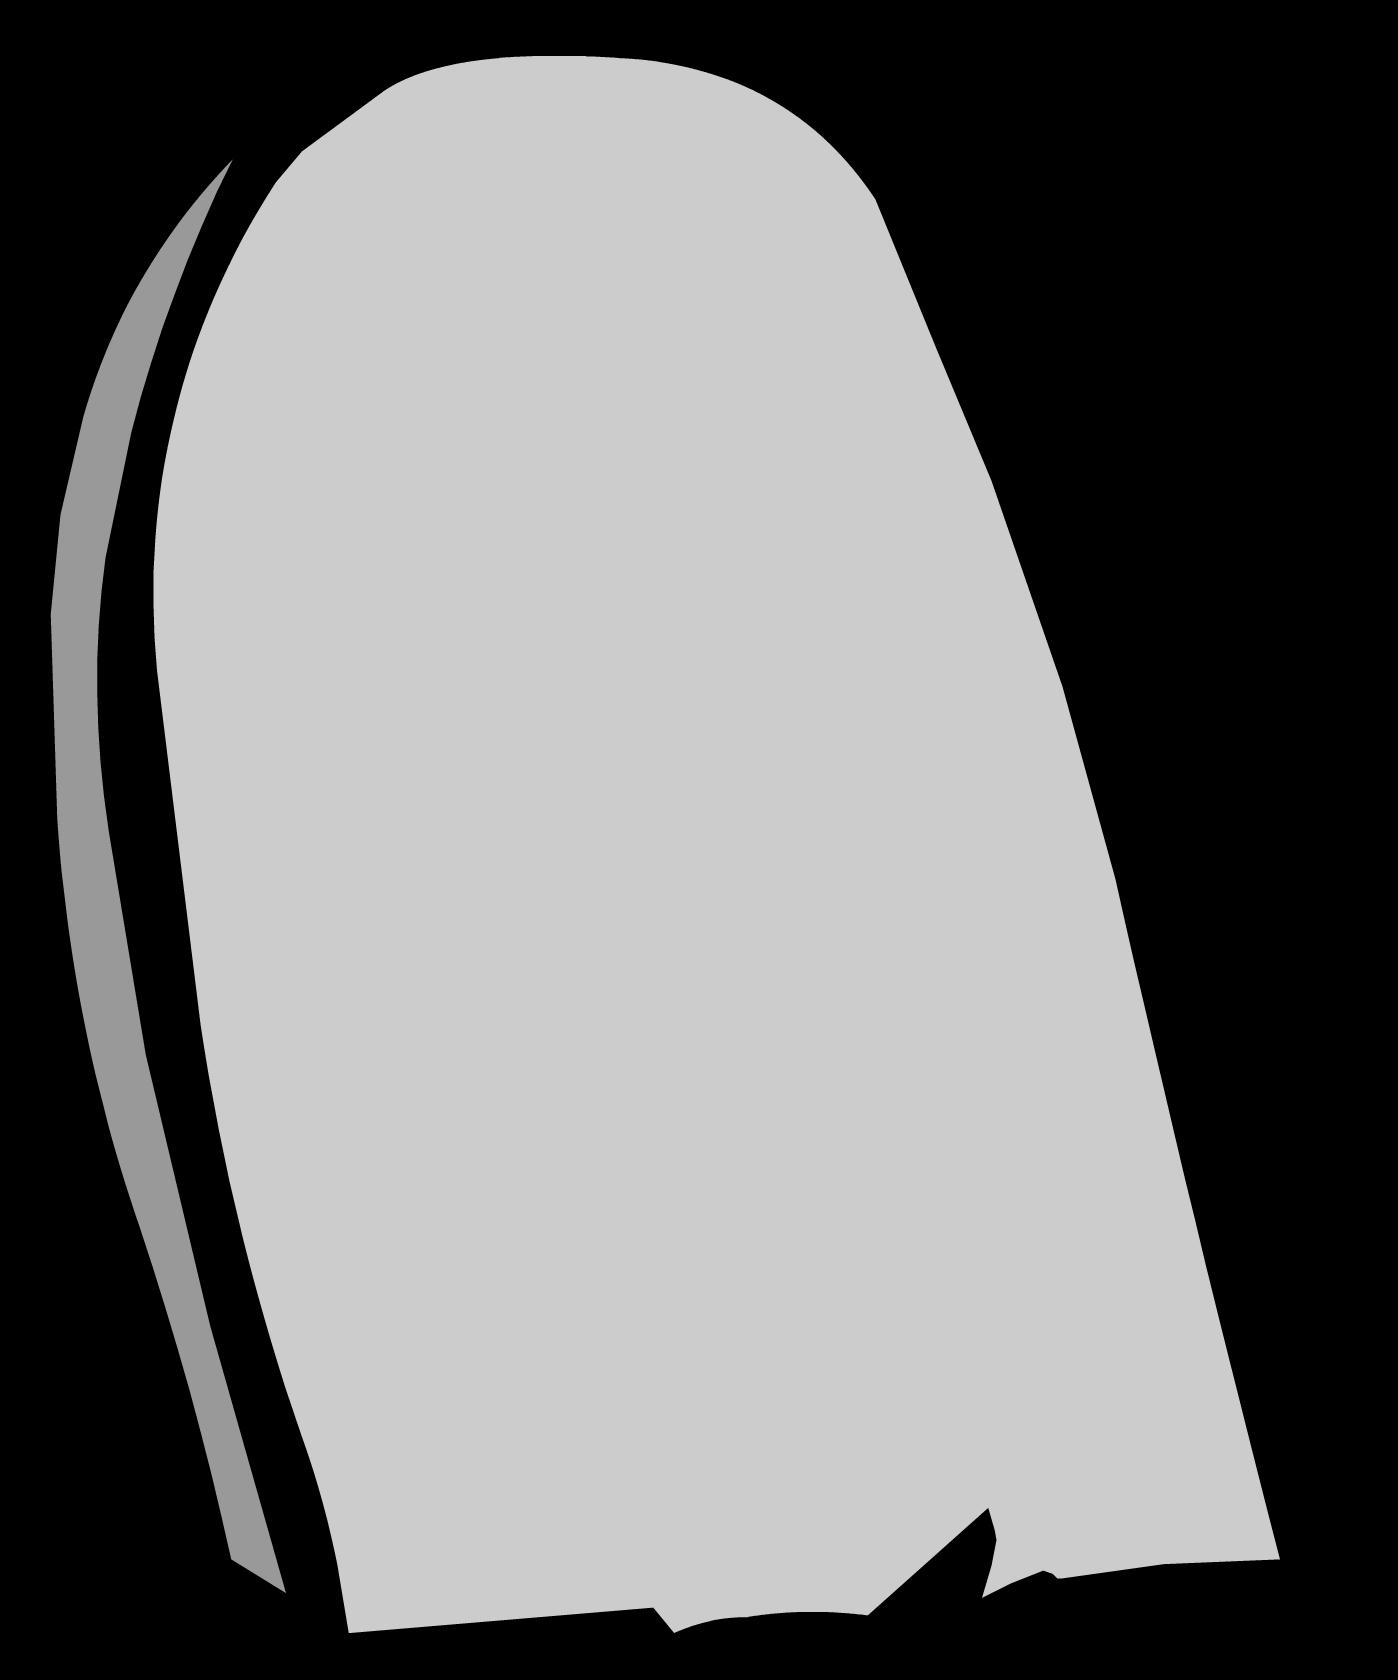 Image tombstoneg club penguin wiki fandom powered by wikia tombstoneg voltagebd Choice Image